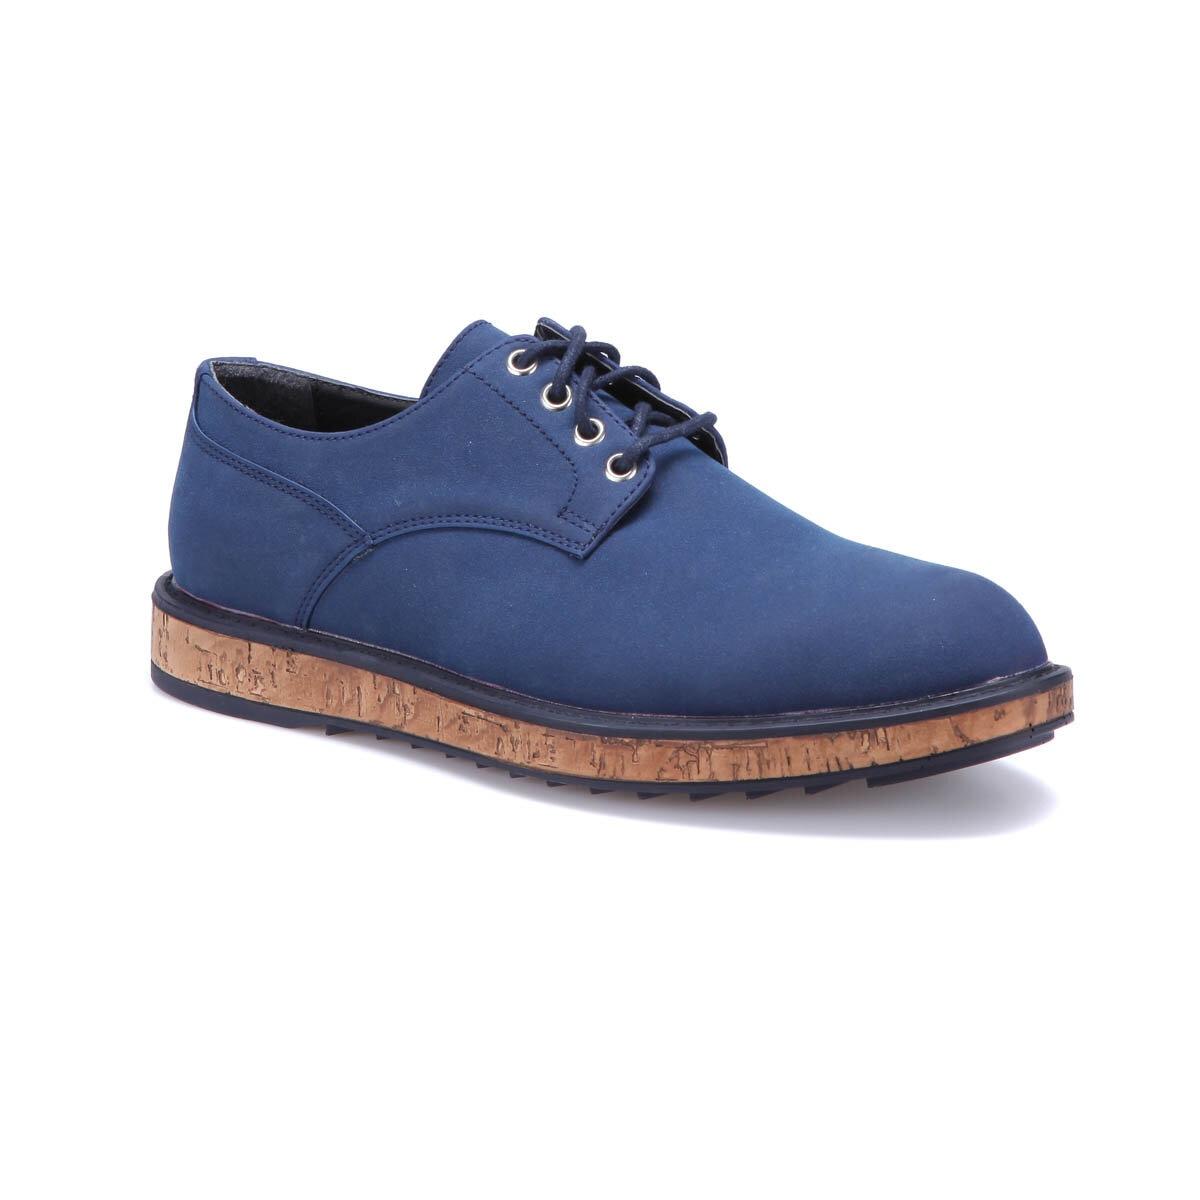 FLO VT-1 Navy Blue Men 'S Modern Shoes-Styles